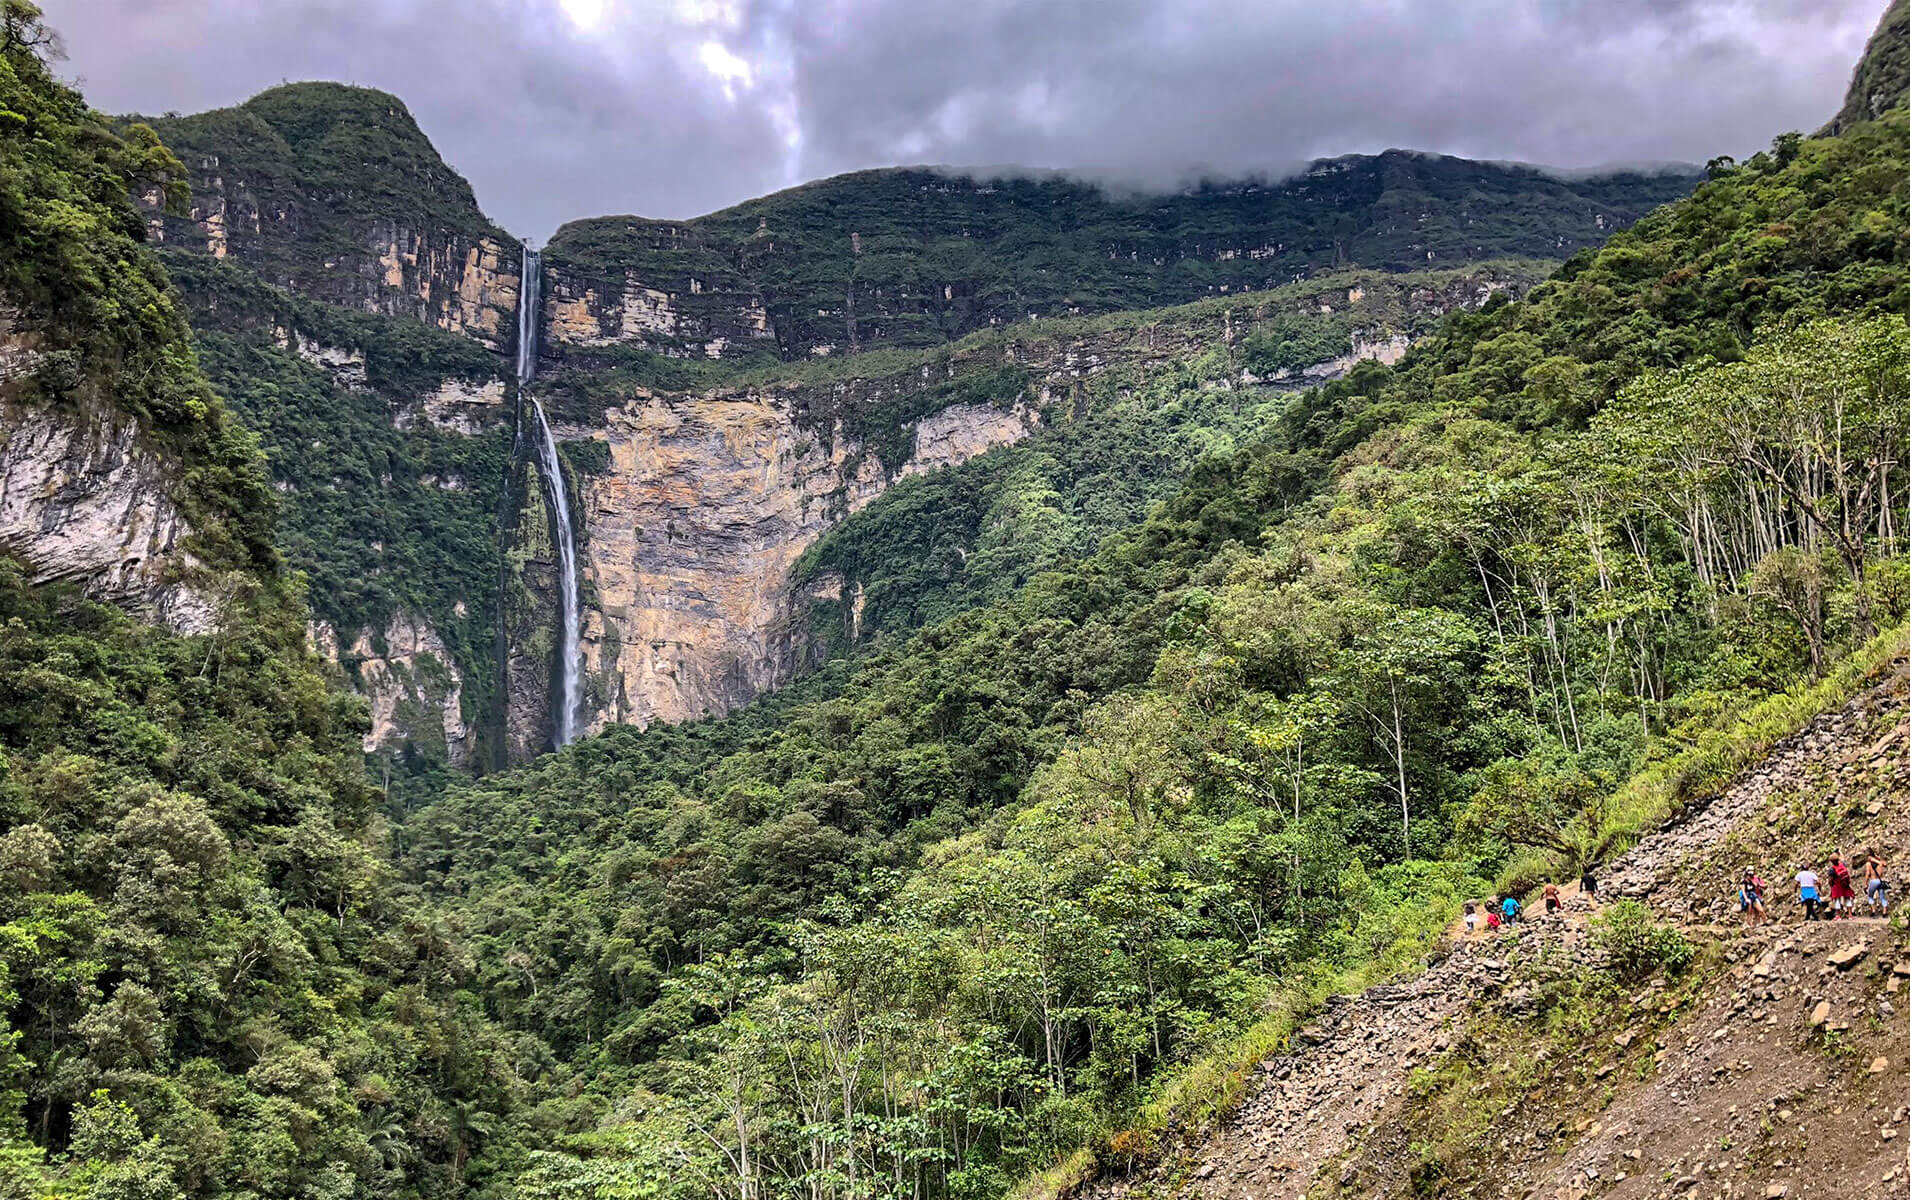 Gocta Wasserfall Bergkulisse